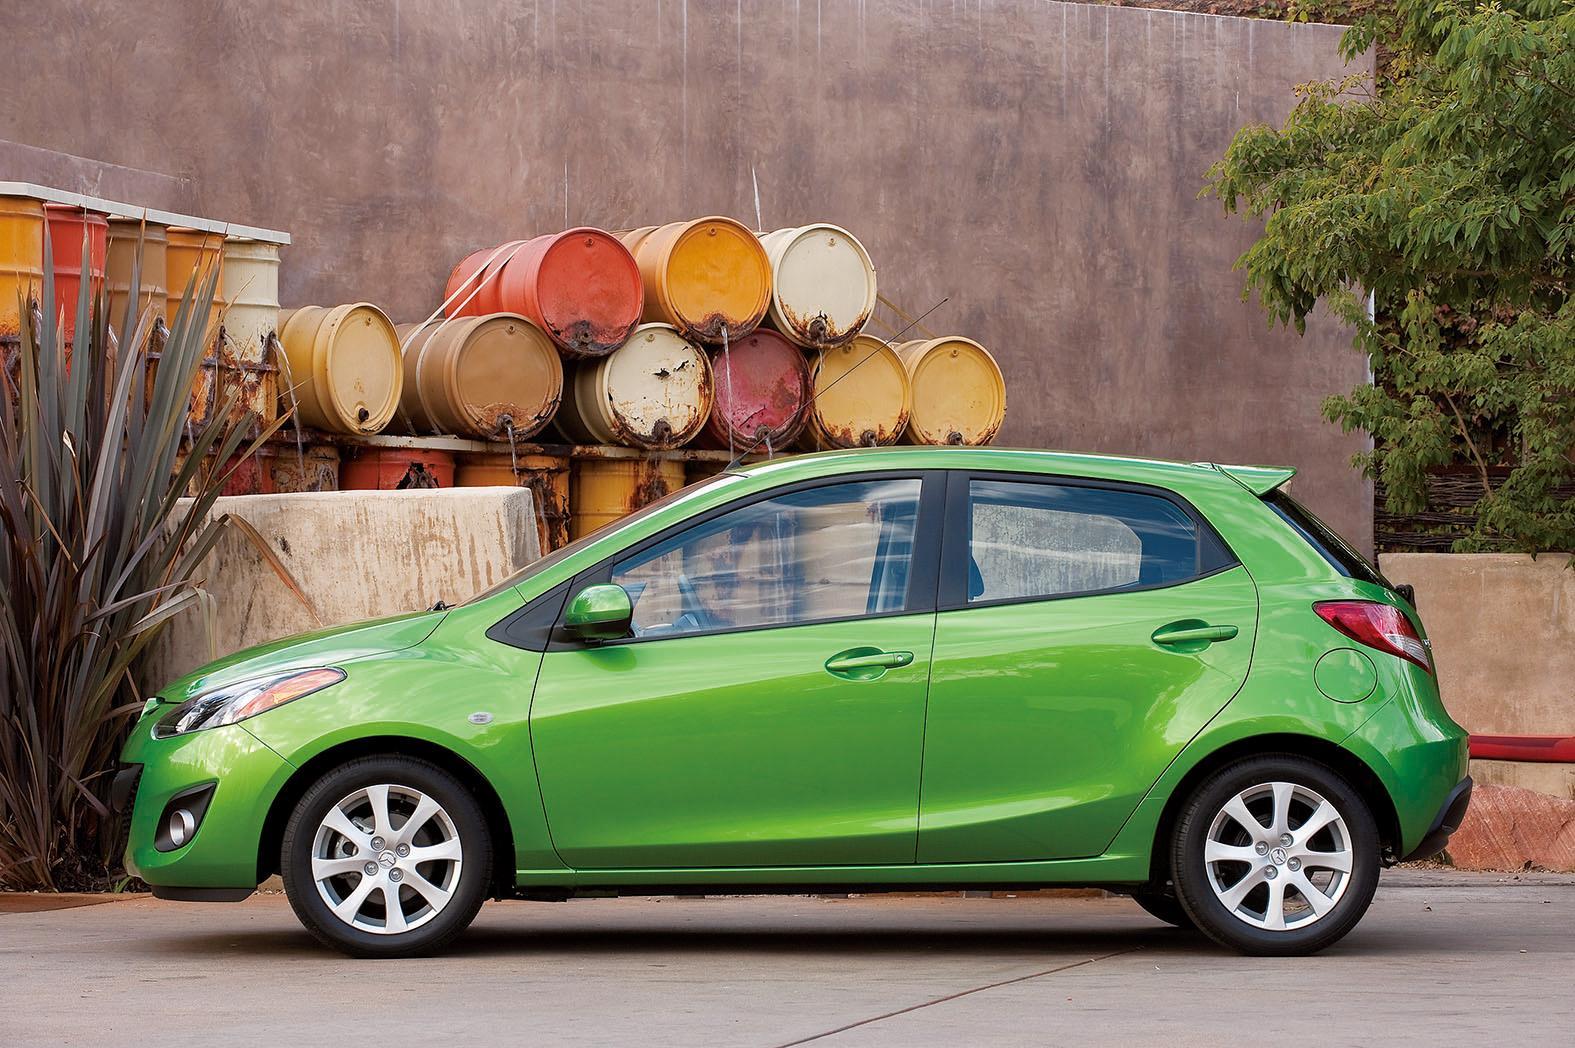 Kelebihan Kekurangan Mazda 2 2011 Review